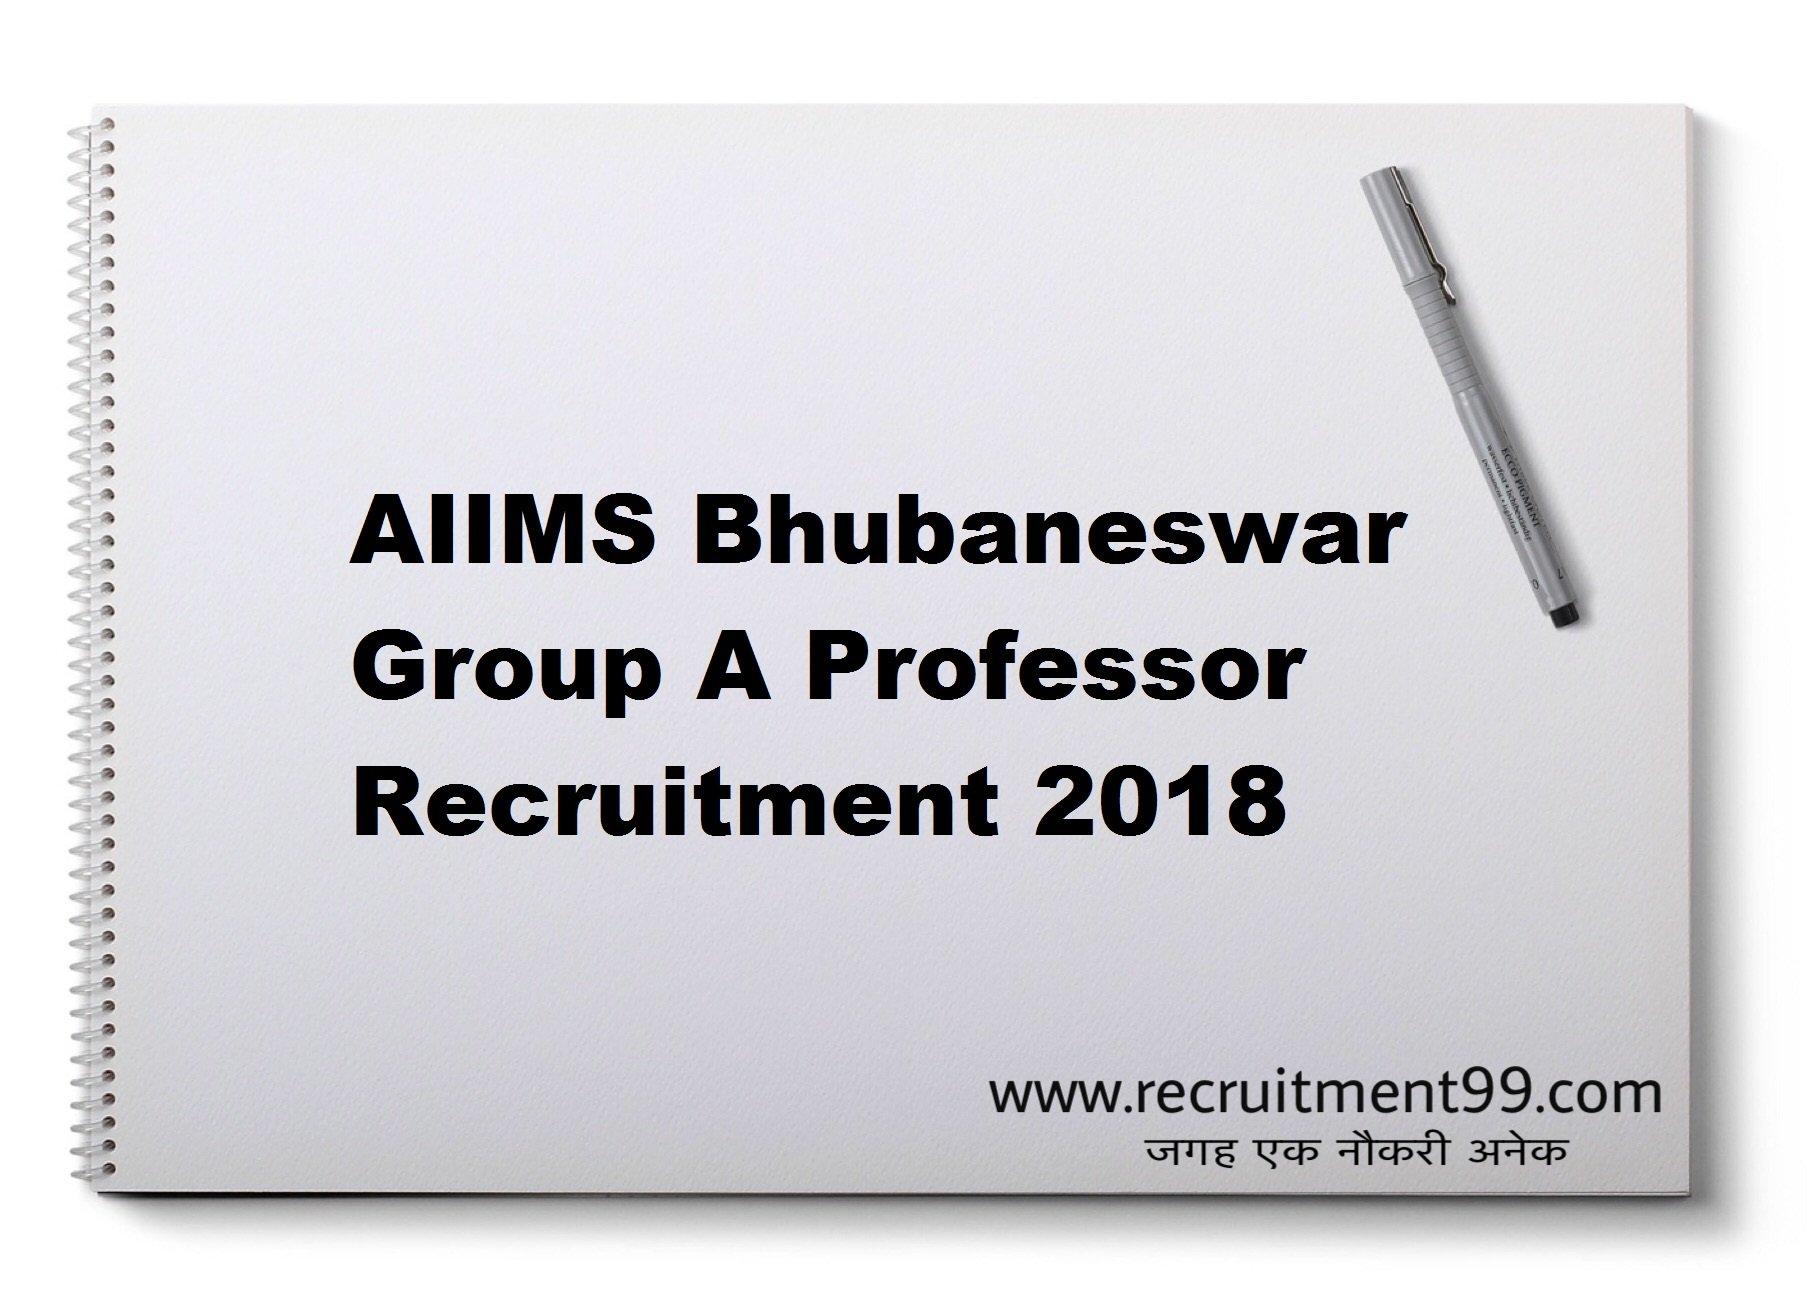 AIIMS Bhubaneswar Group A Faculty Professor Recruitment Admit Card Result 2018